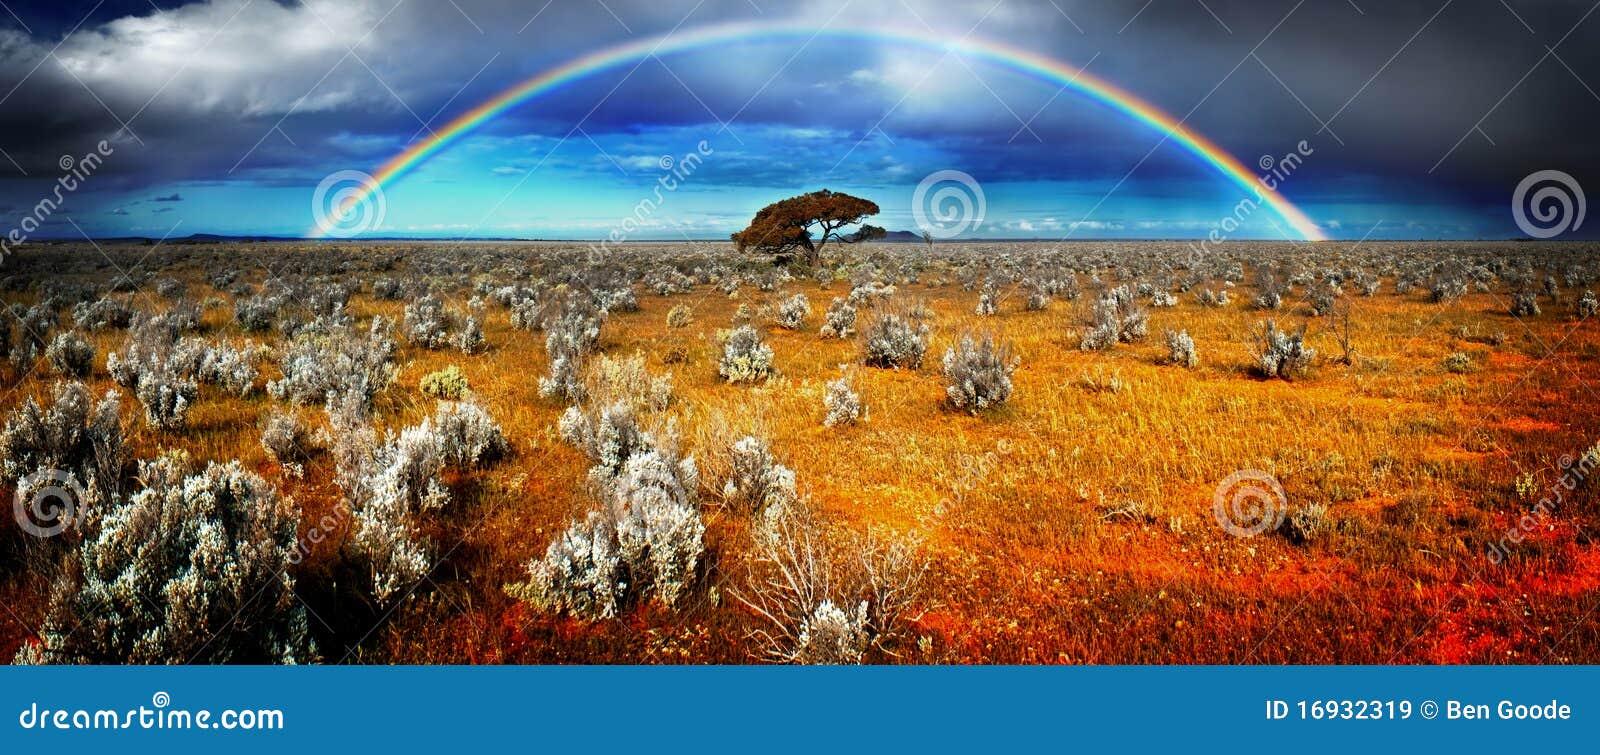 Regenbogen-Wüste